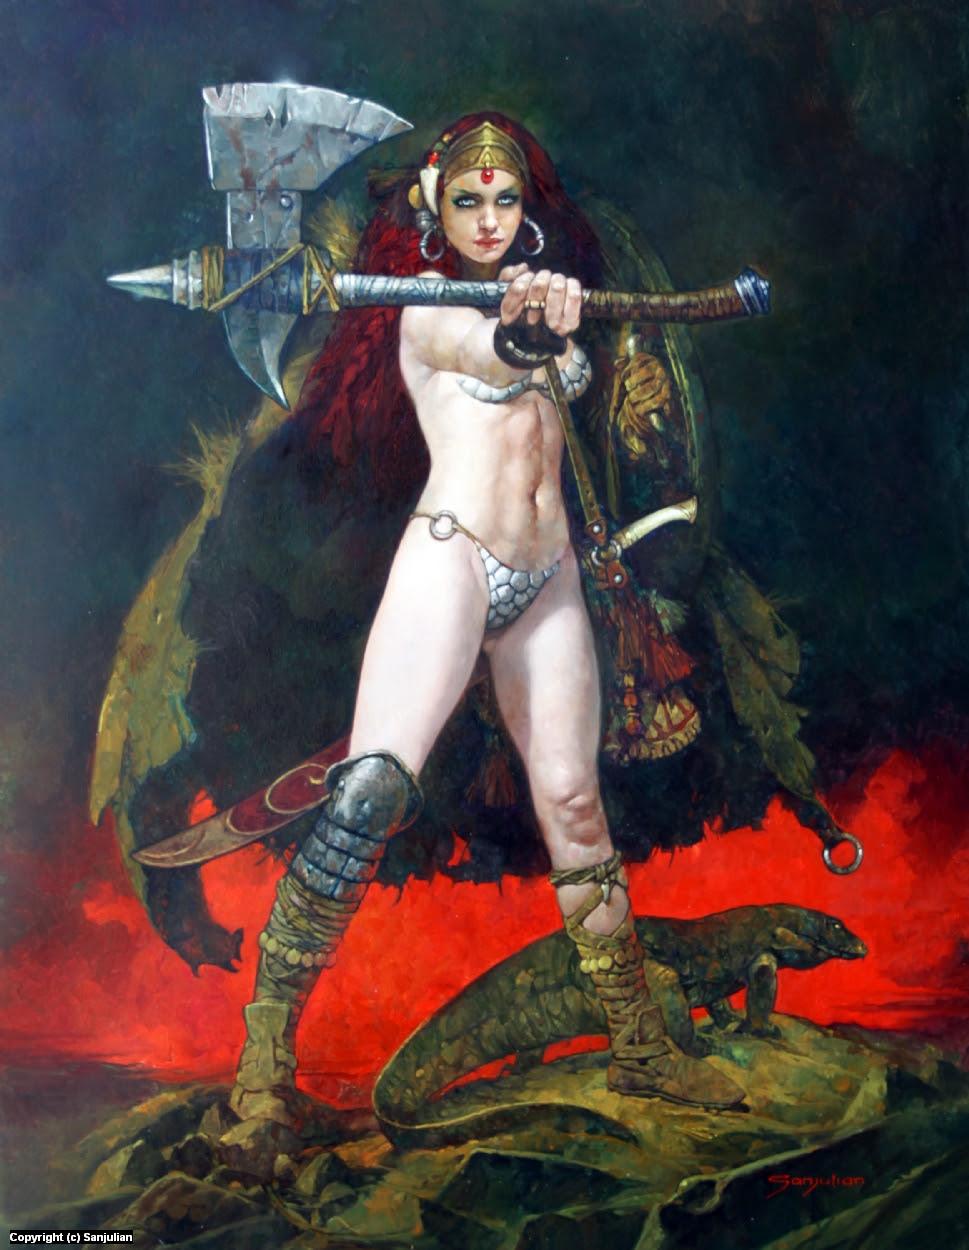 Warrior Princess Artwork by Manuel Sanjulian